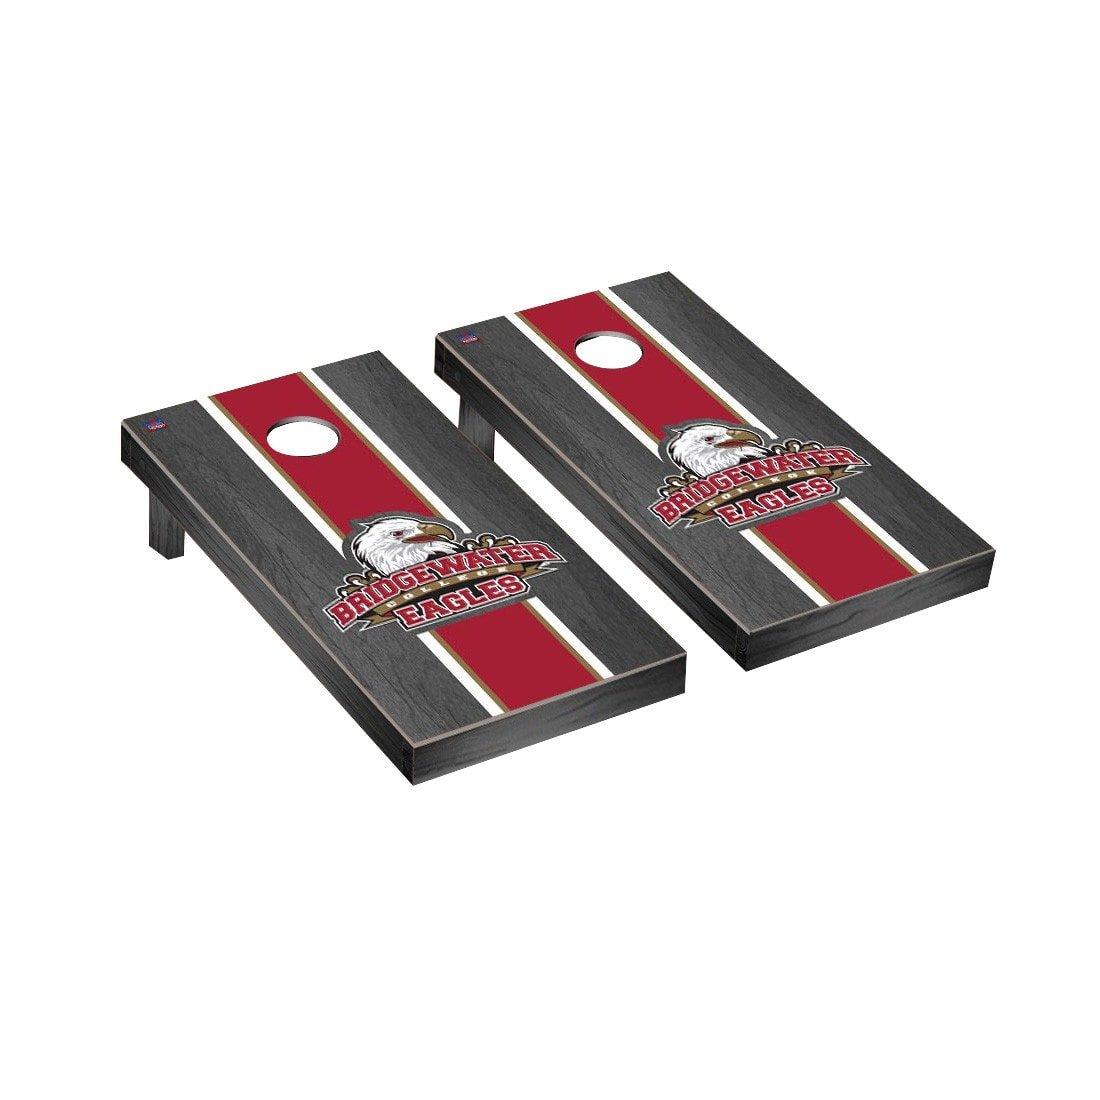 Victory Tailgate Bridgewater Eagles Regulation Cornhole Game Set Onyx Stained Stripe Version